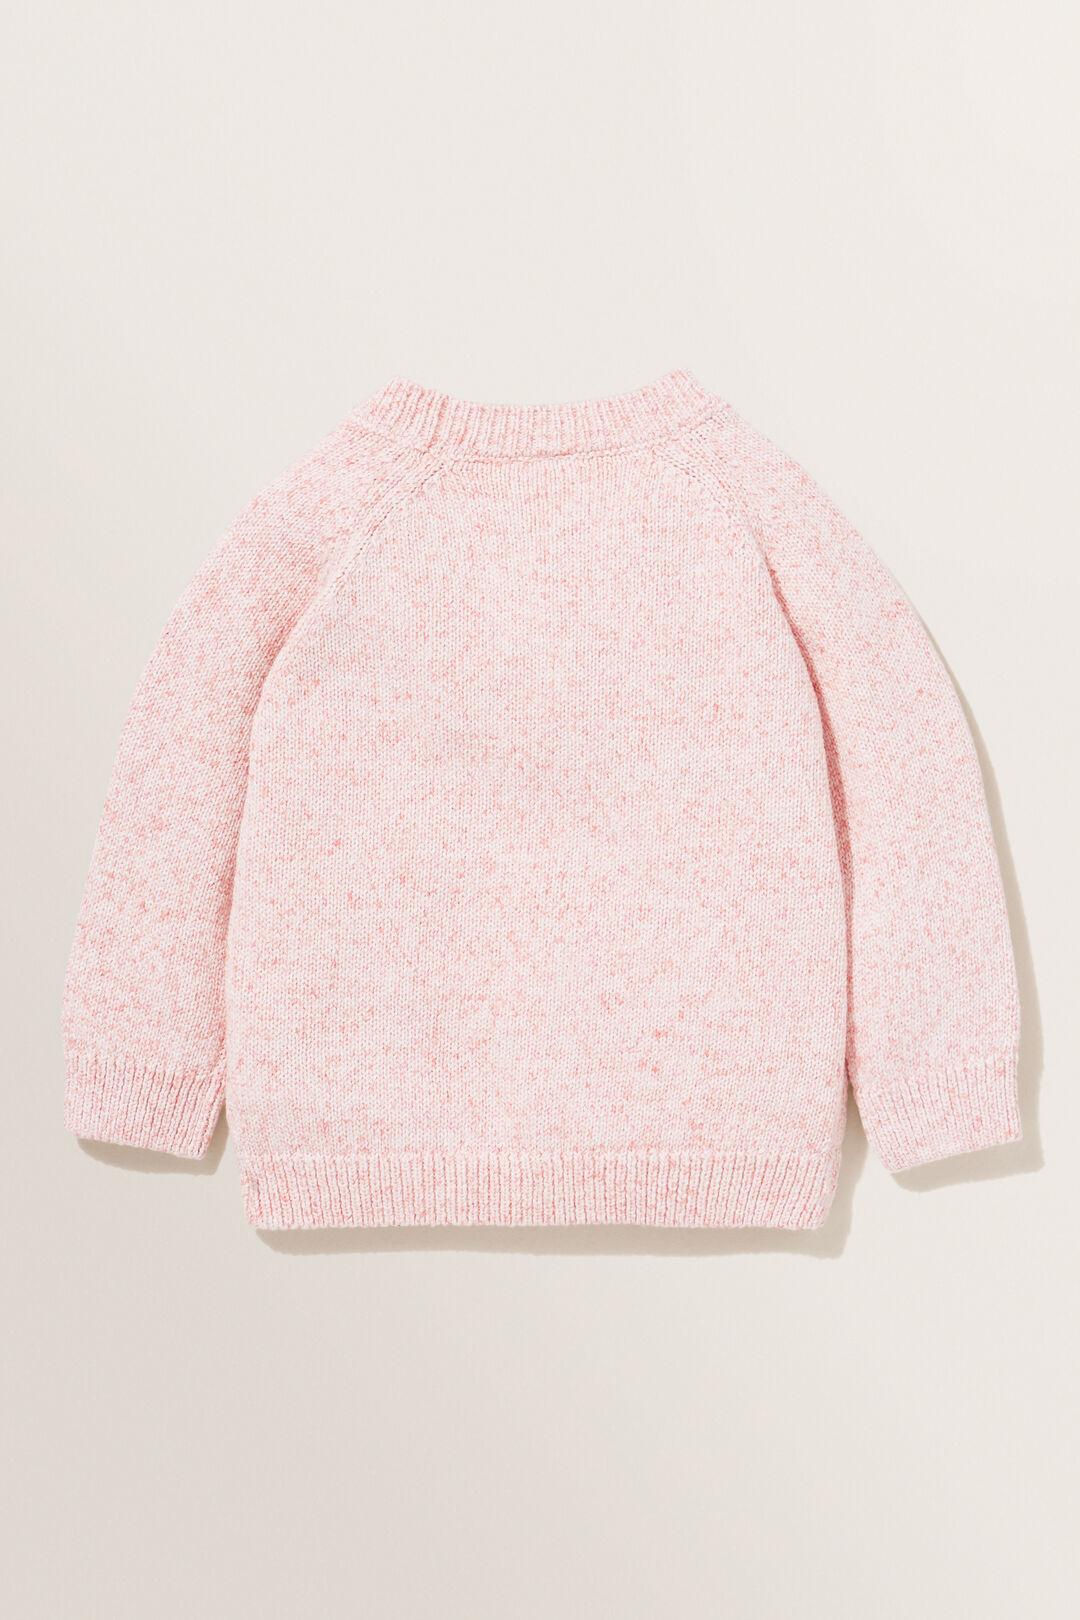 Knitted Raglan Cardigan  CORAL  hi-res